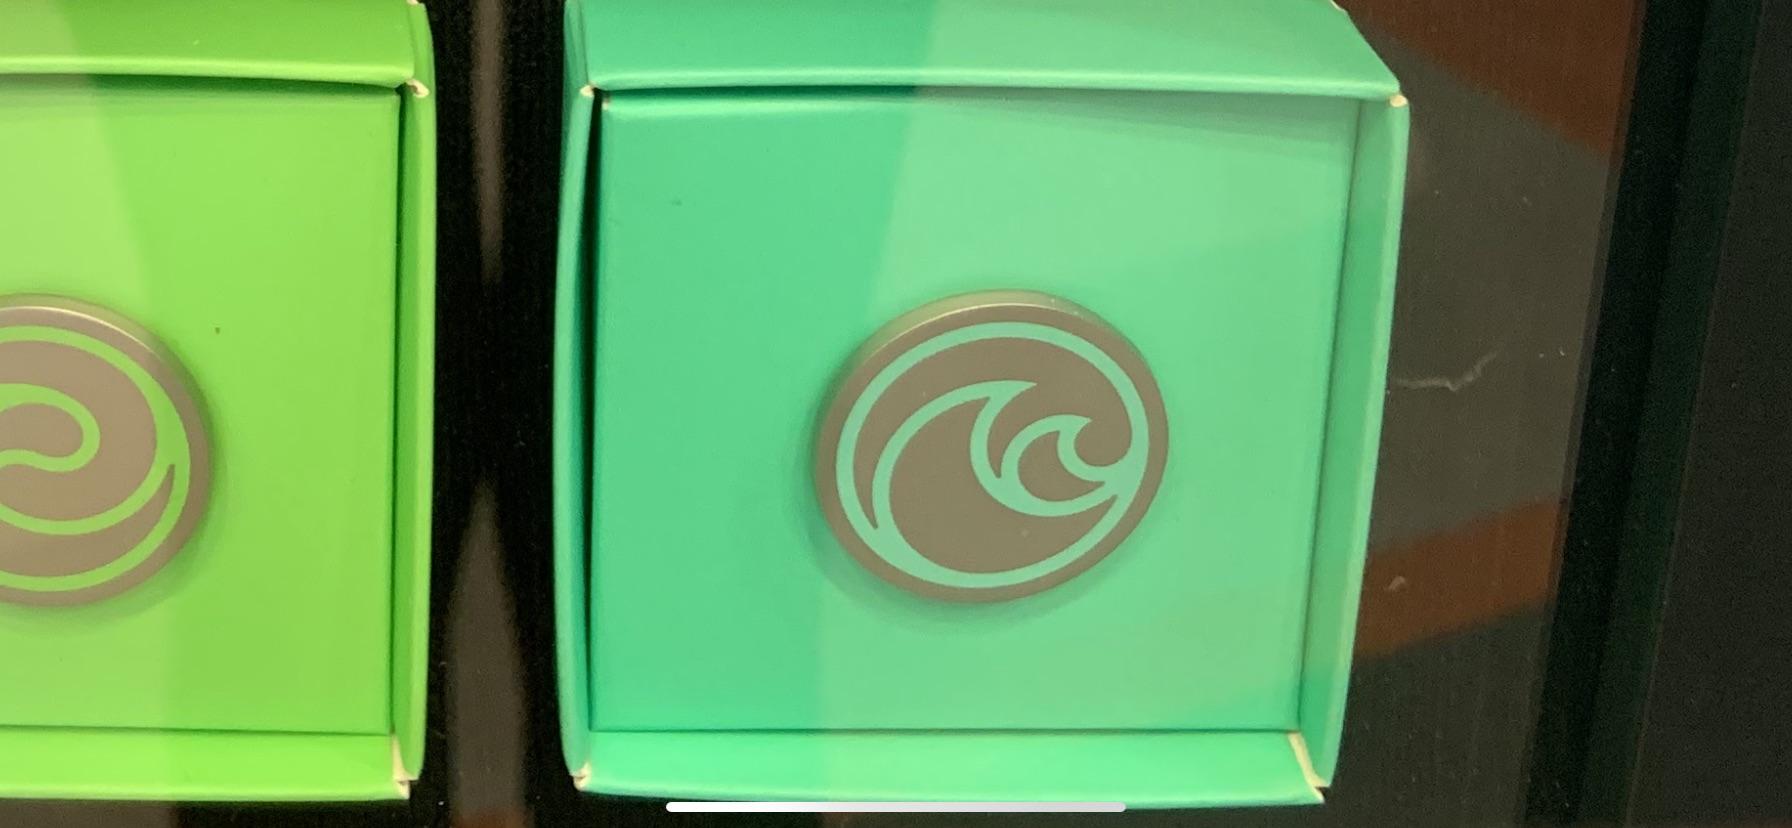 EPCOT pavilion logo pins 12/23/19 20